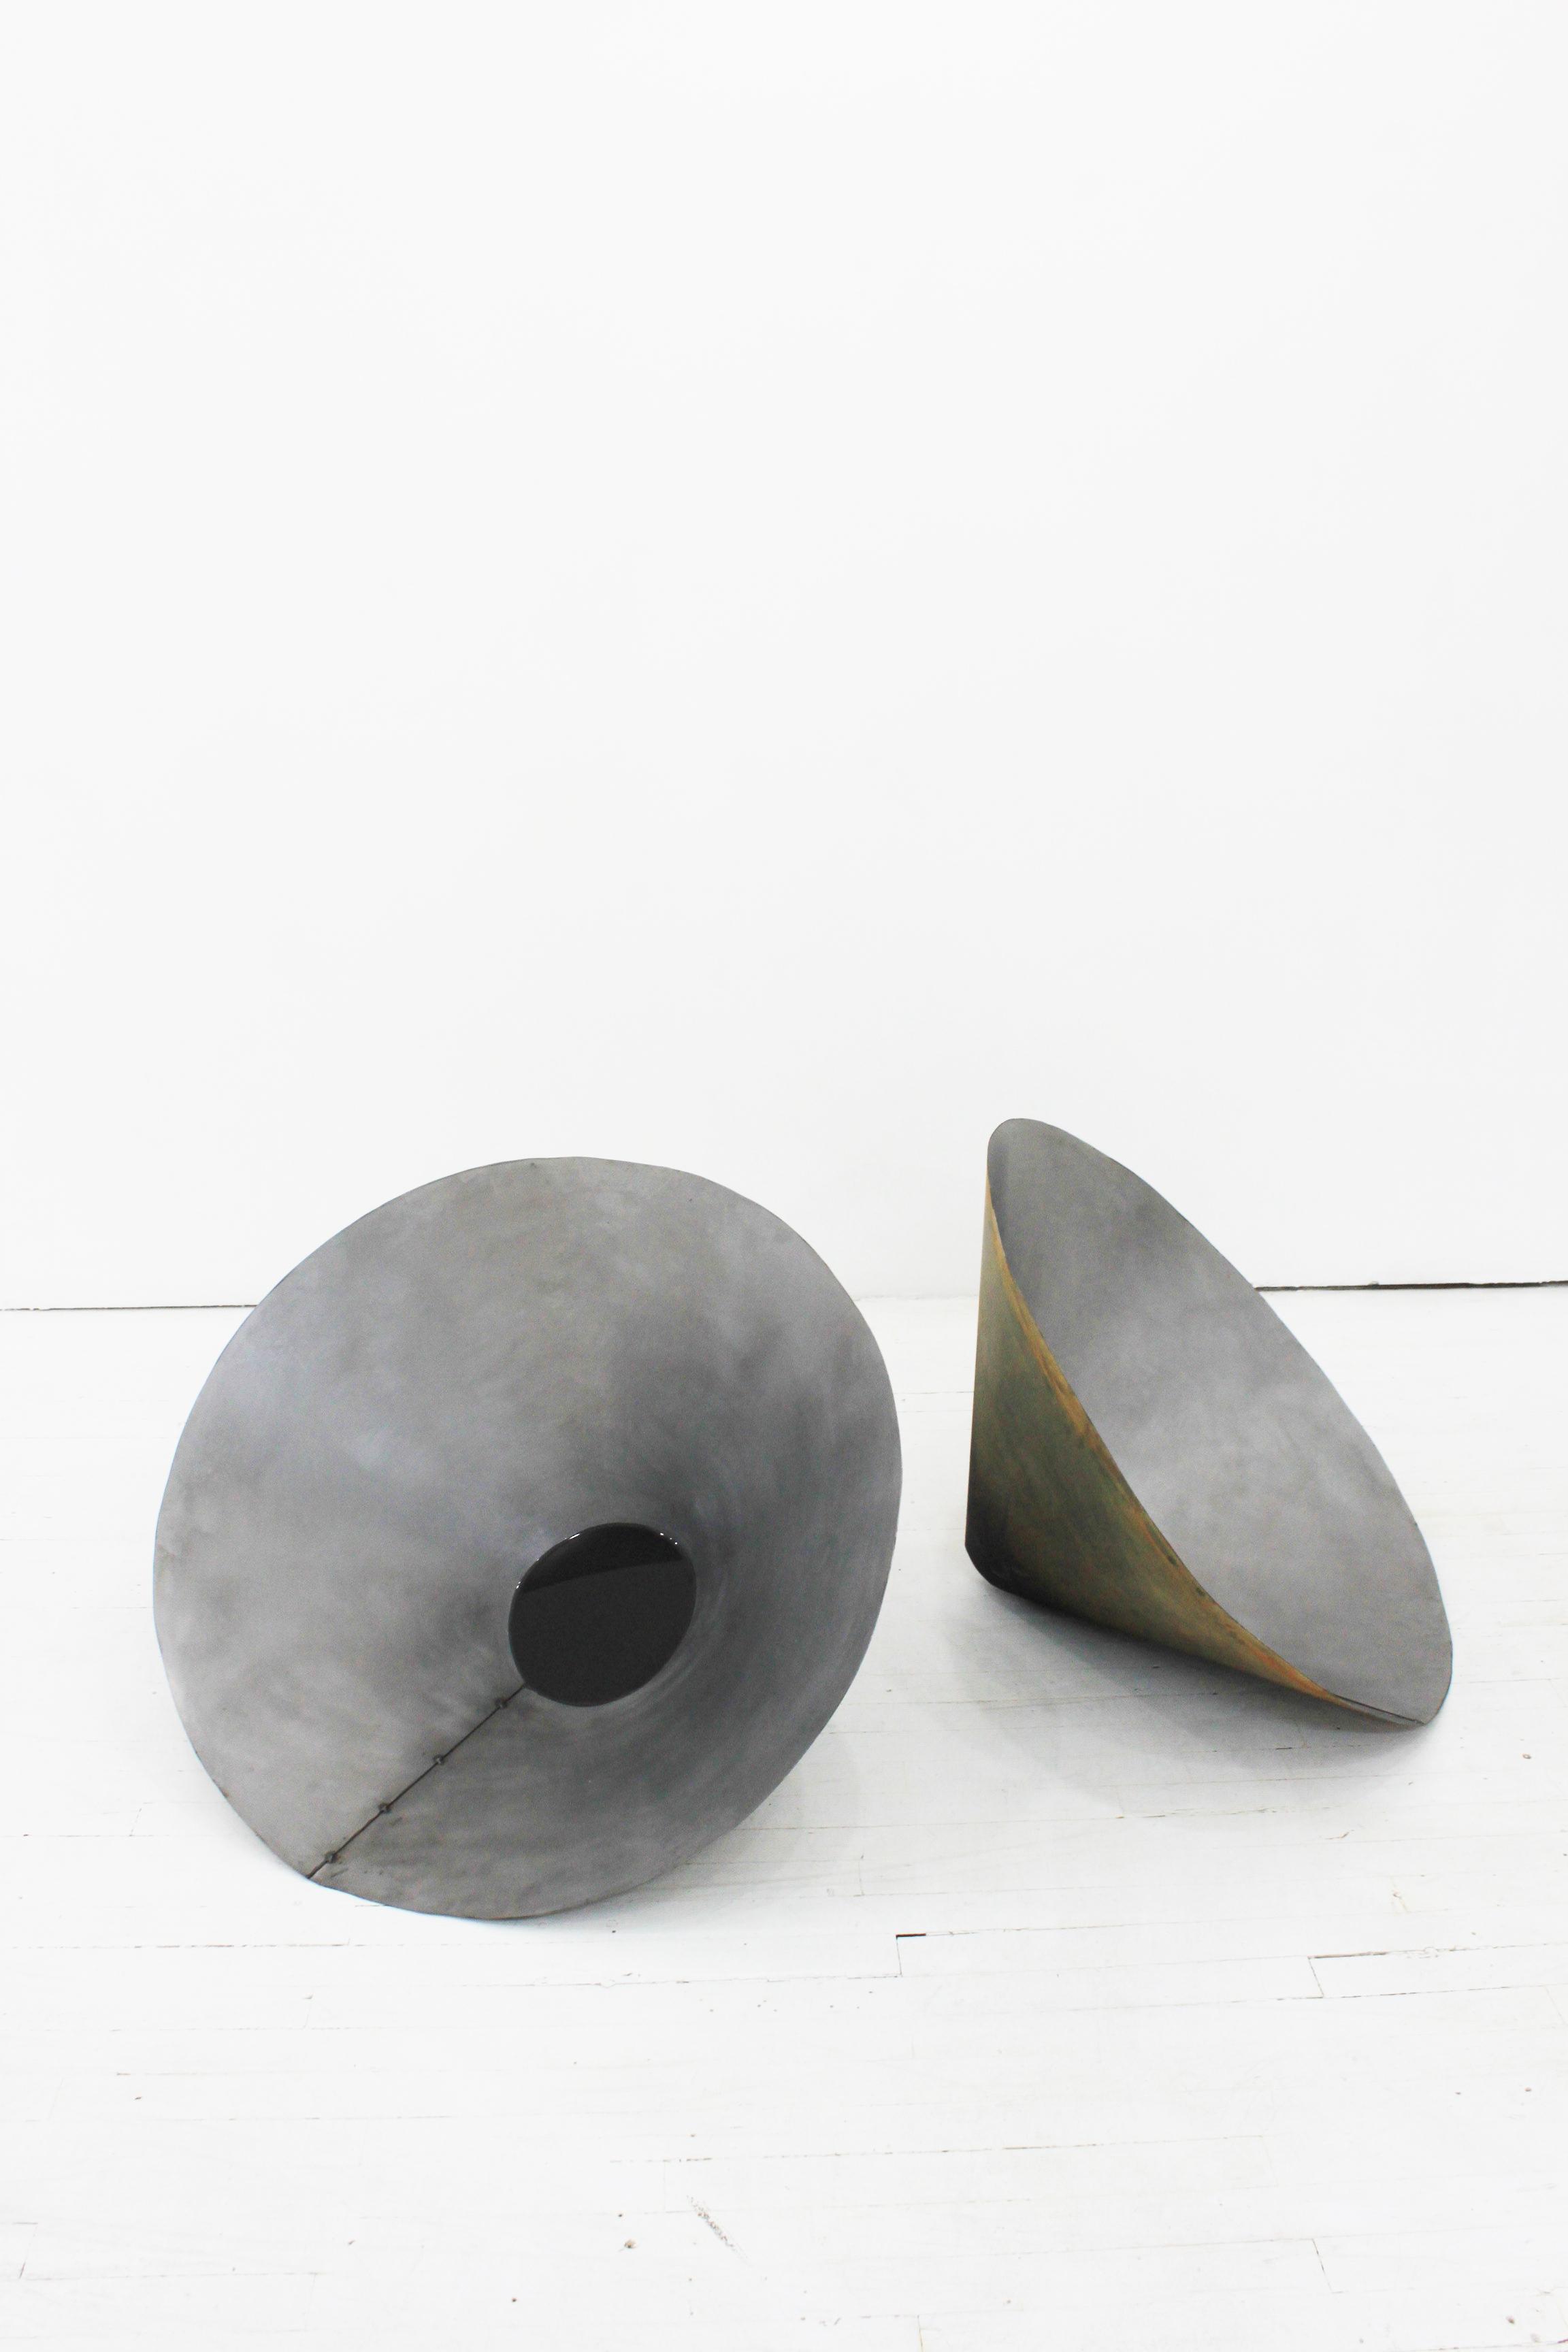 "Soo Shin\ Silence on My Ears\ steel, concrete, primer, resin\ h28"" w30"" d20""\2017"